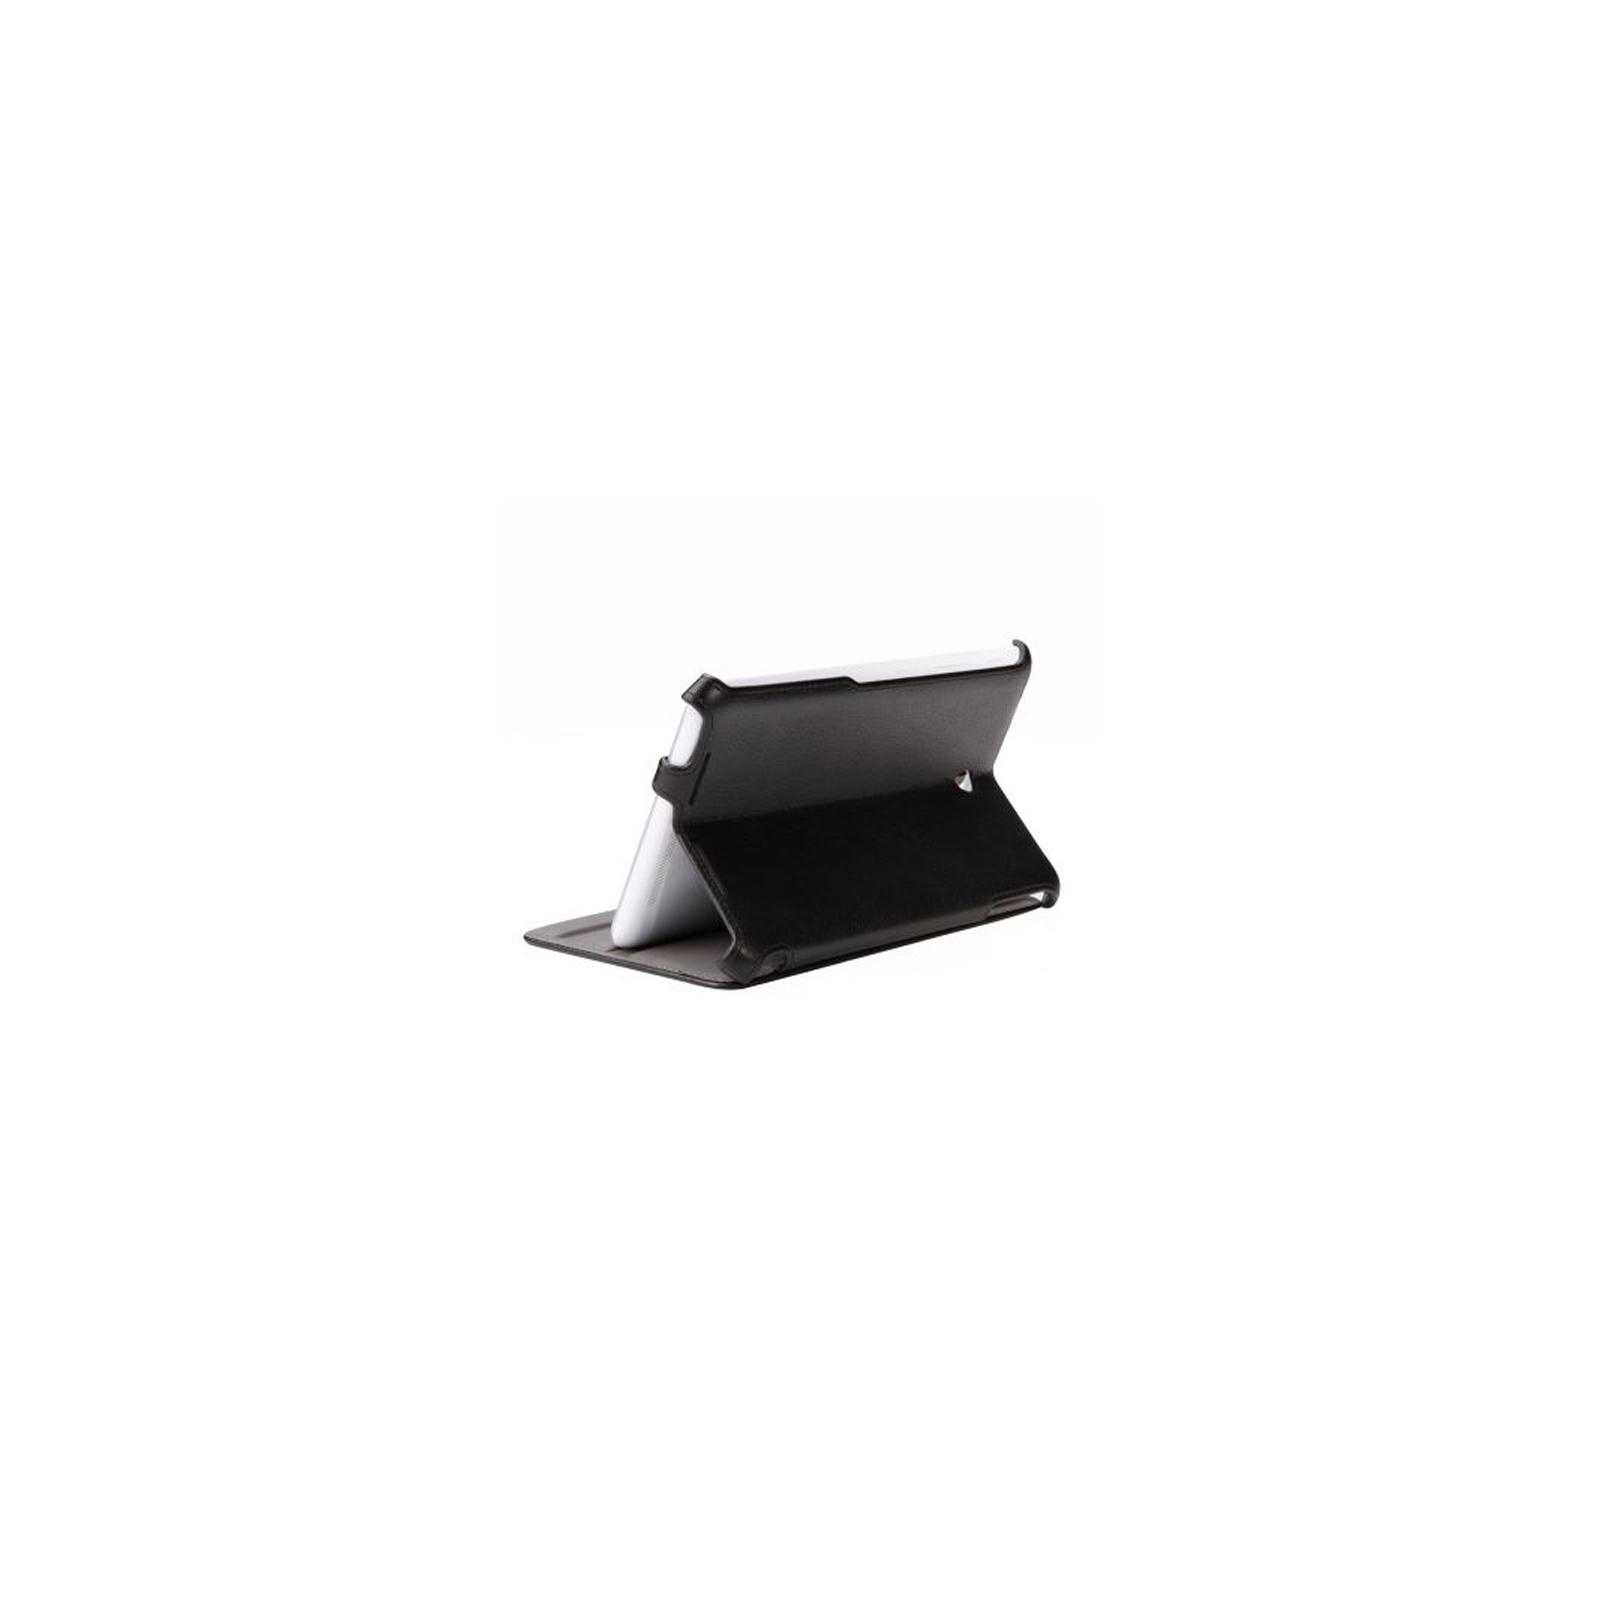 Чехол для планшета AirOn для Asus MeMO Pad 8 black (6946795830153)